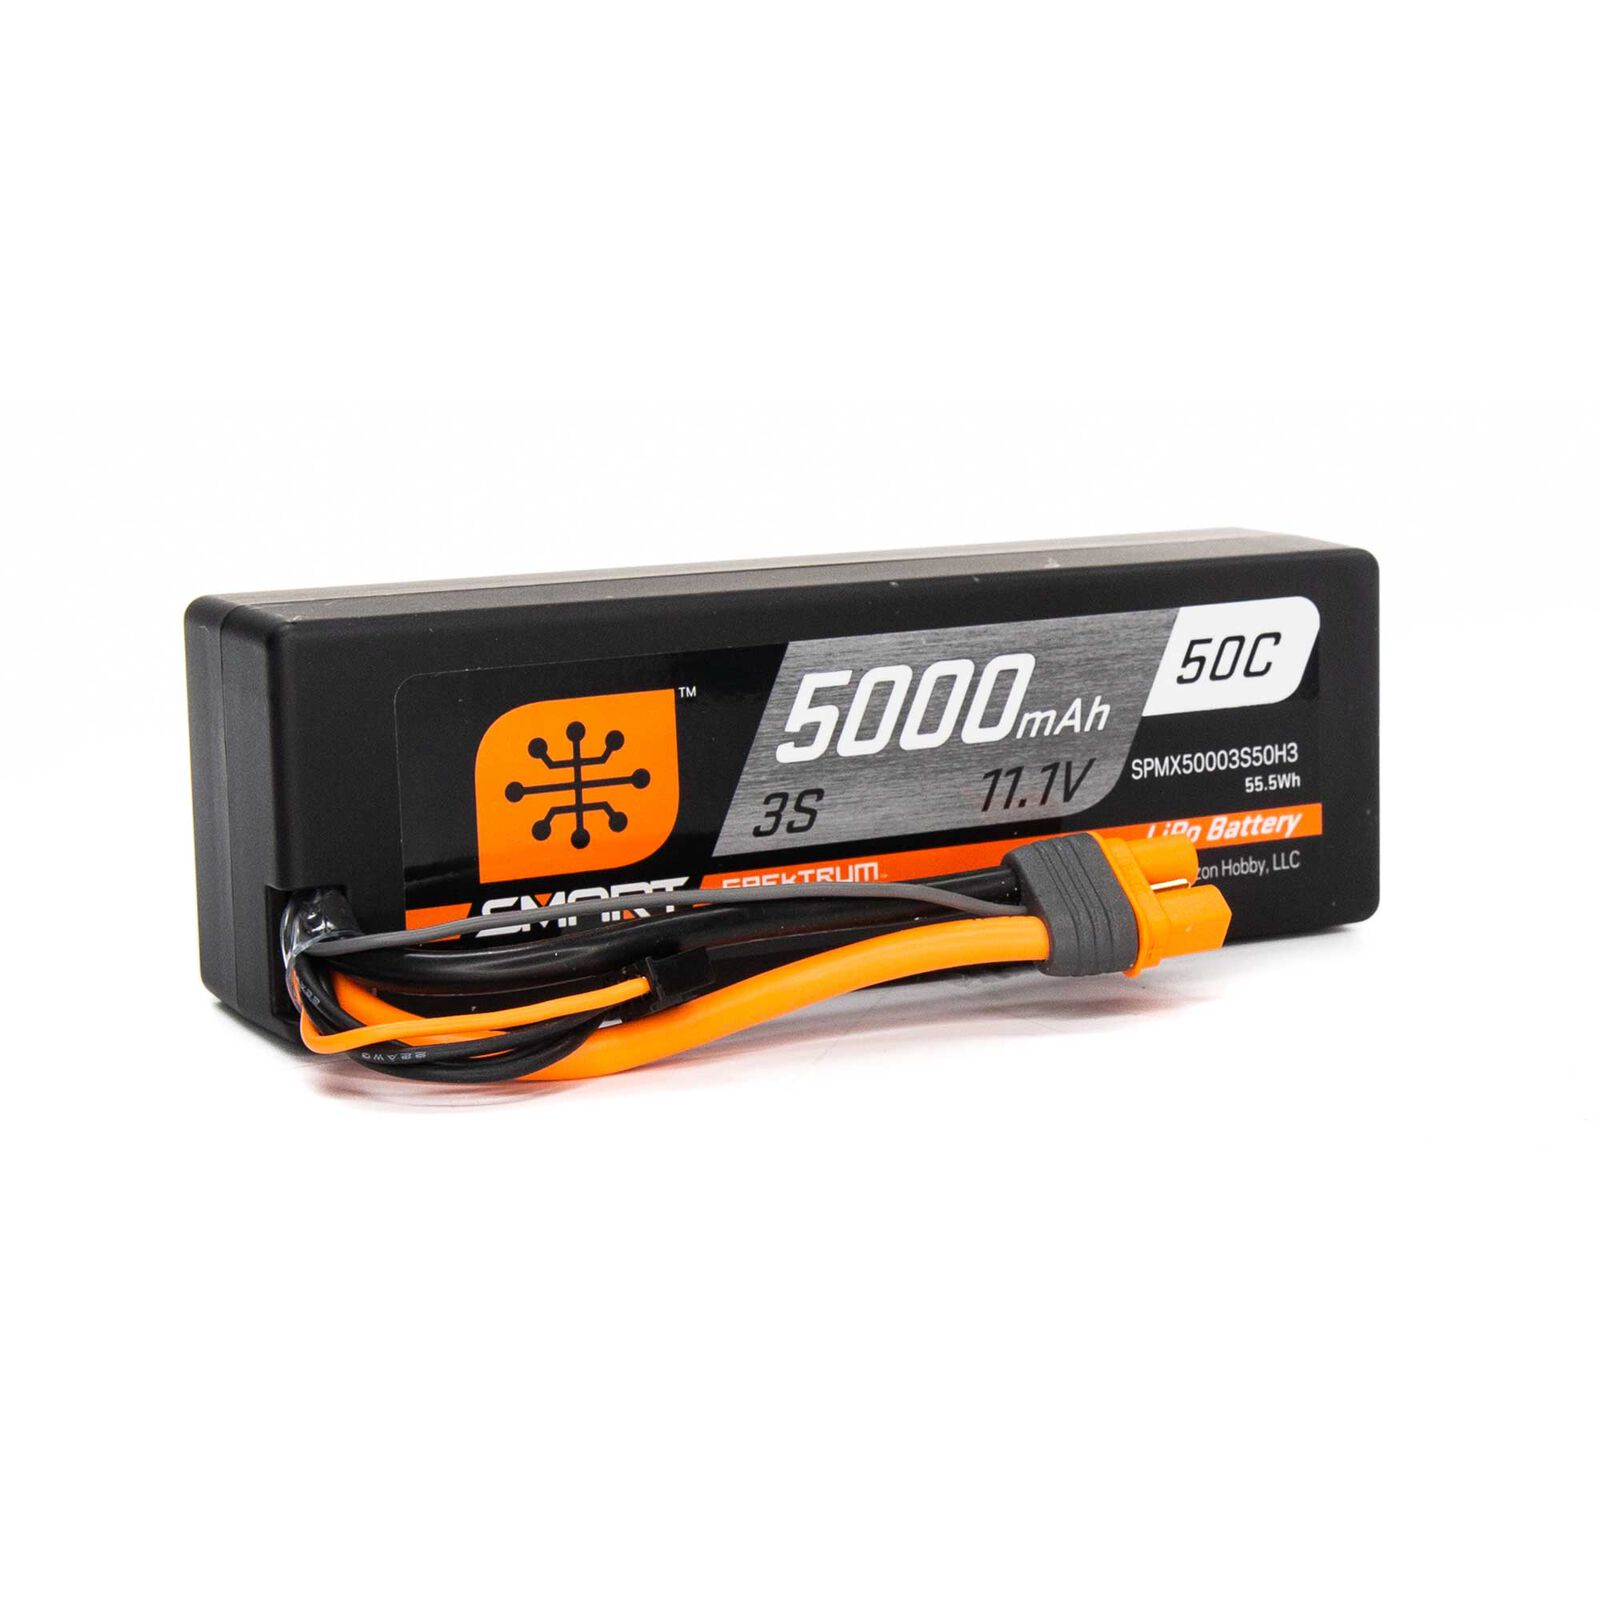 11.1V 5000mAh 3S 50C Smart Hardcase LiPo Battery: IC3